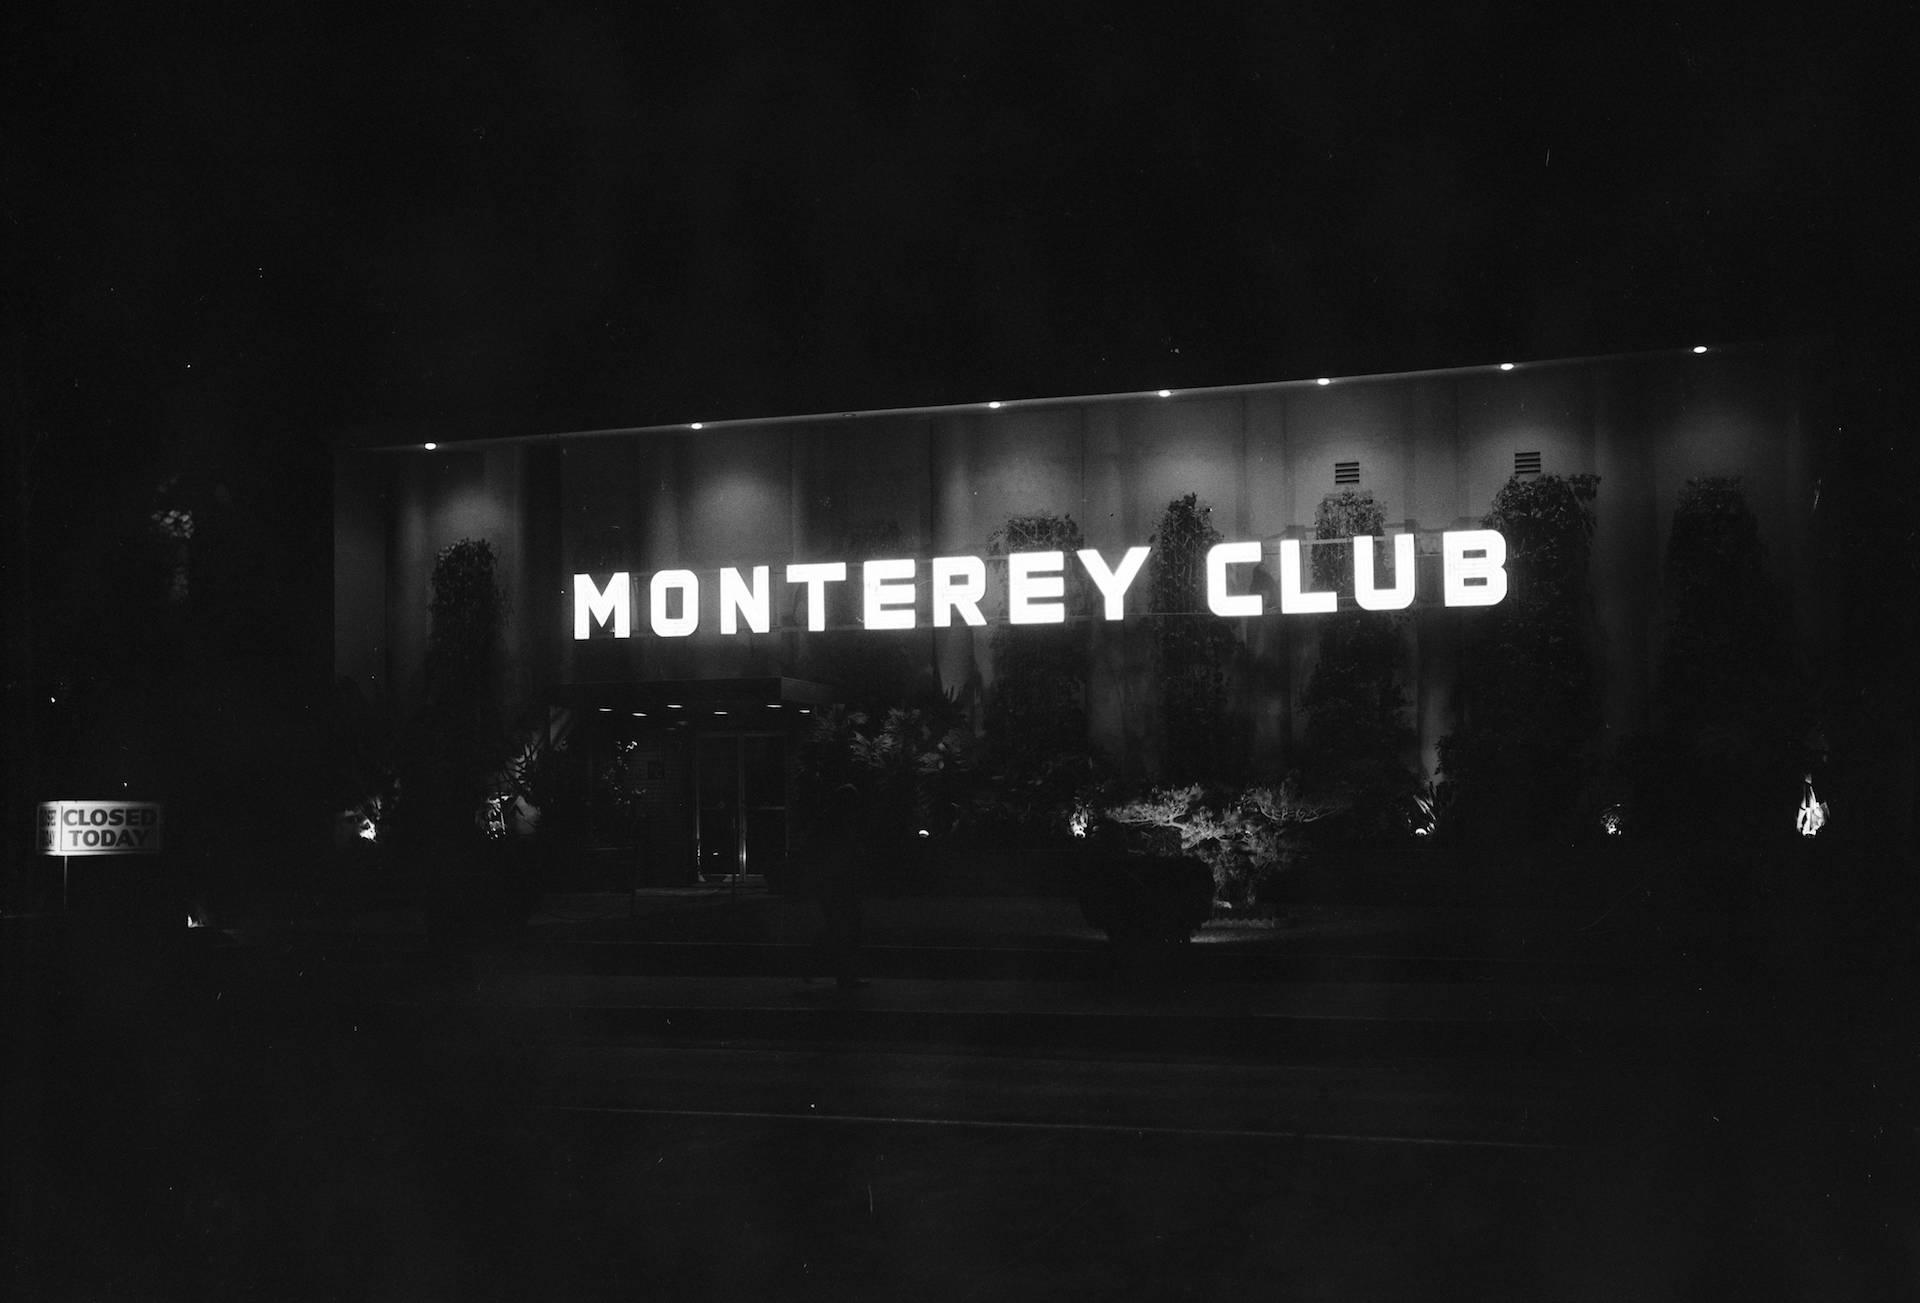 Monterey Club, 1960